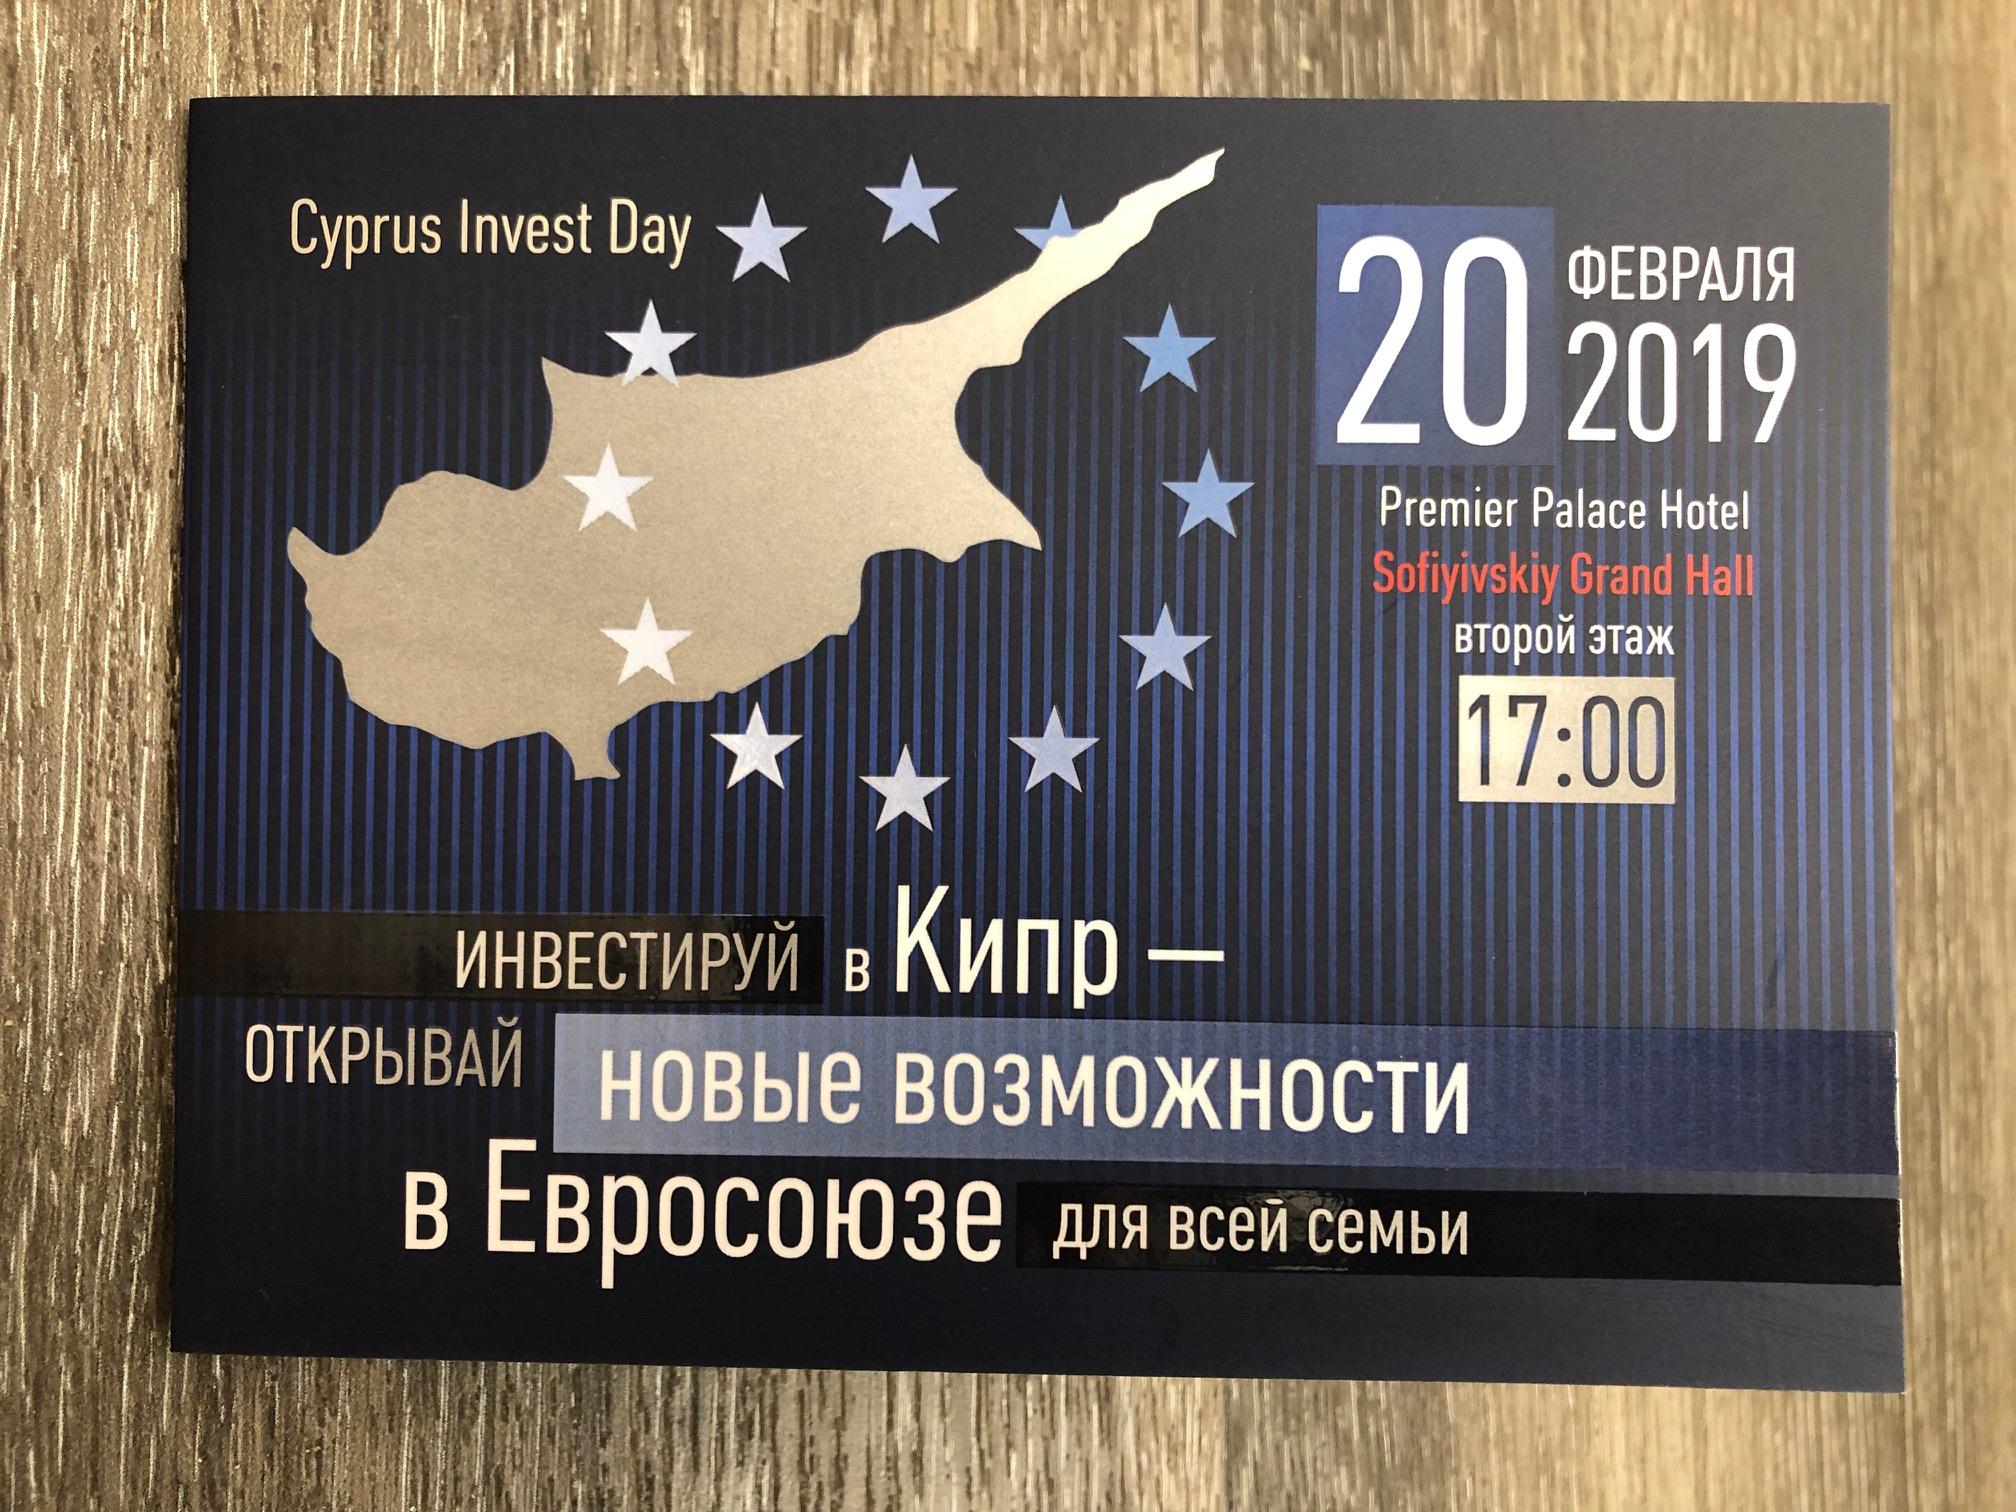 Cyprus Invest Day invitation